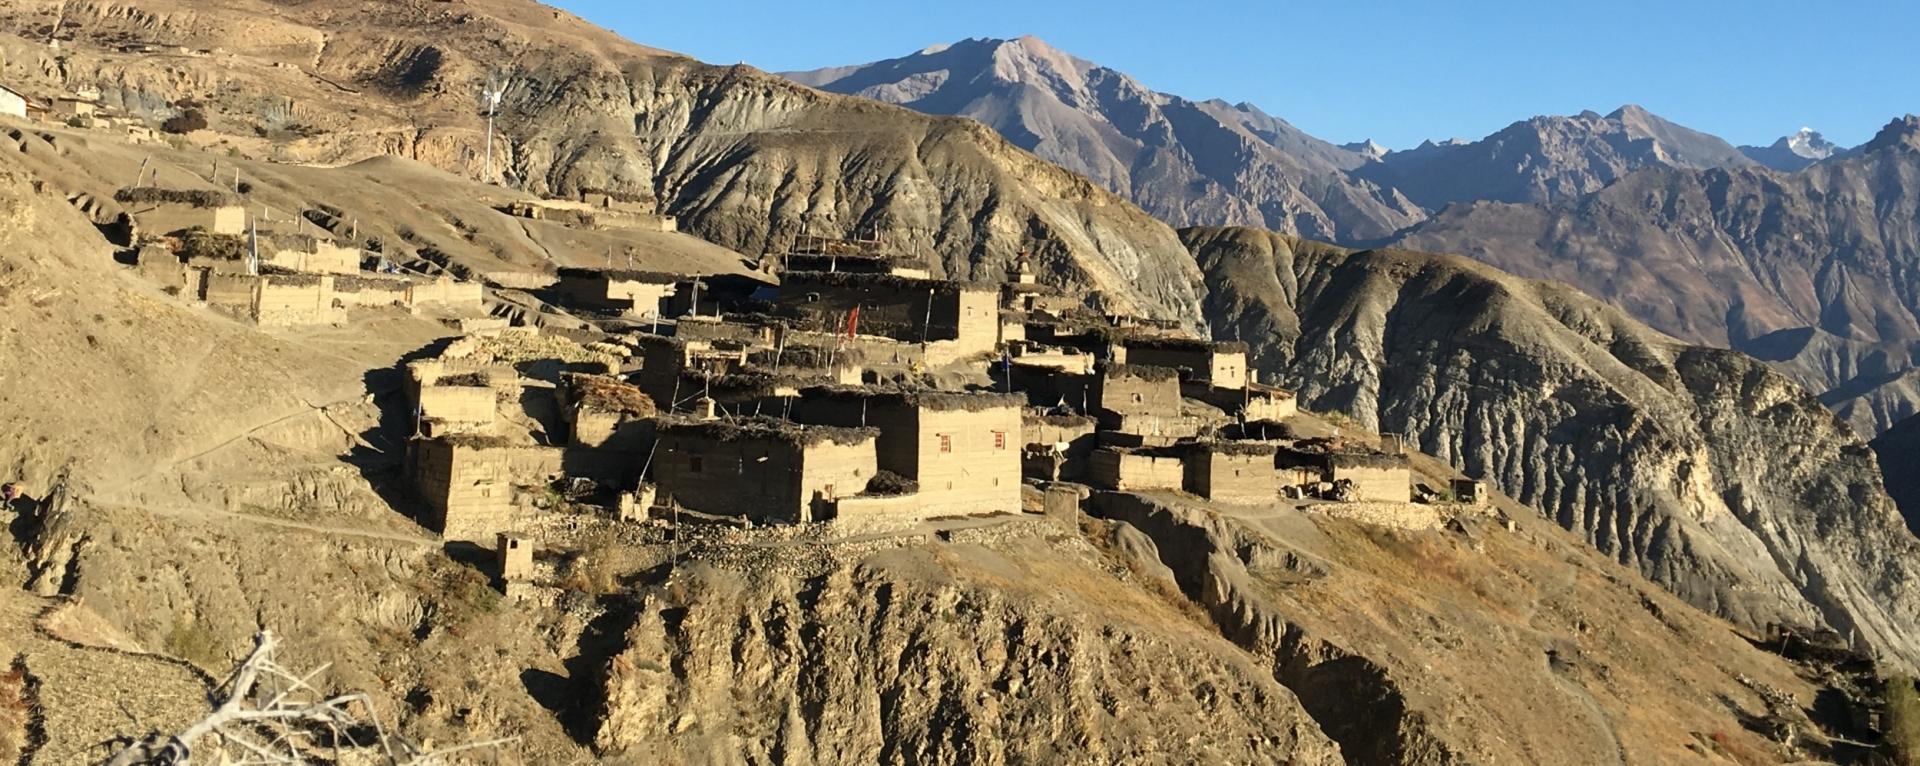 The village of Saldang, Upper Dolpo, Nepal